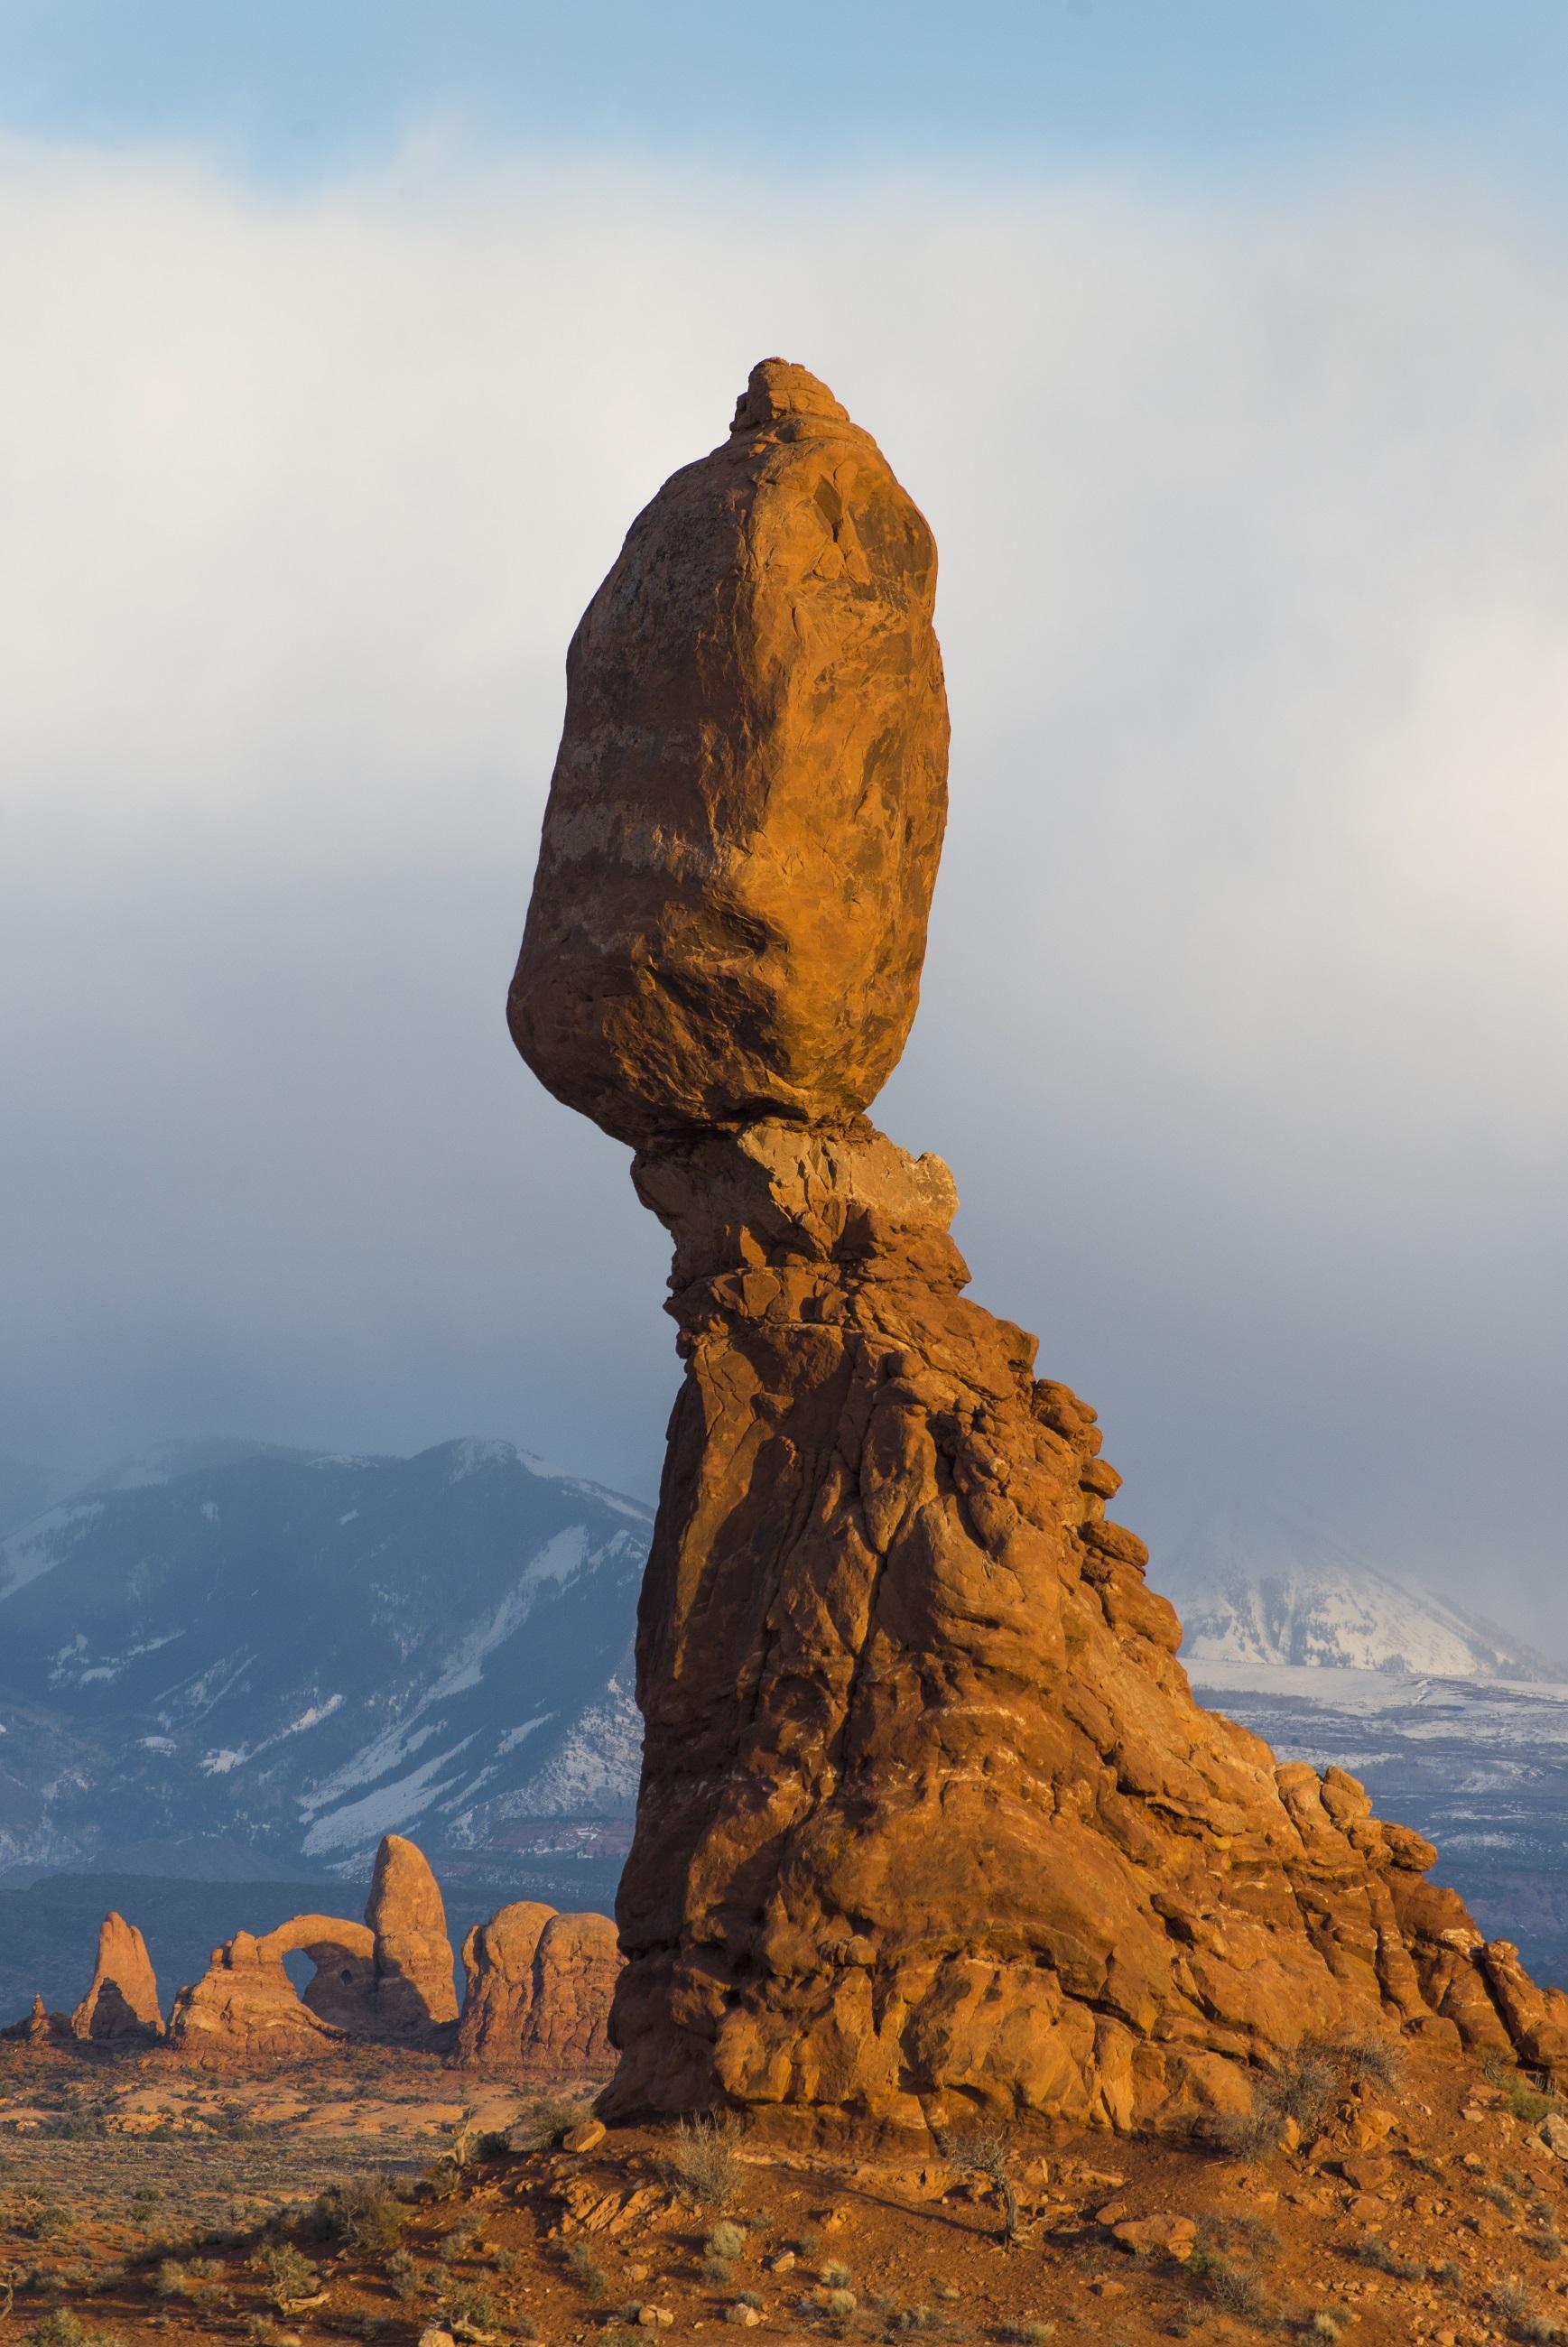 Balanced rock photo